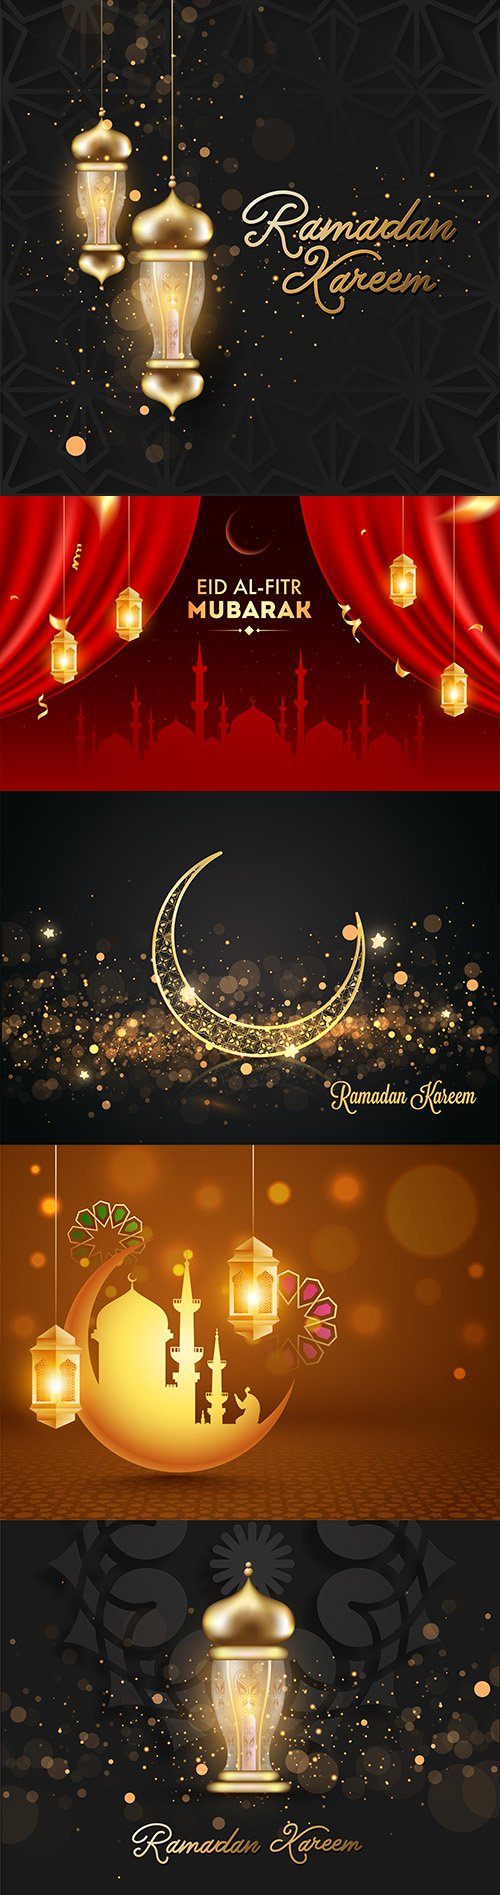 Ramadan Kareem lantern gold highlight and effect shining